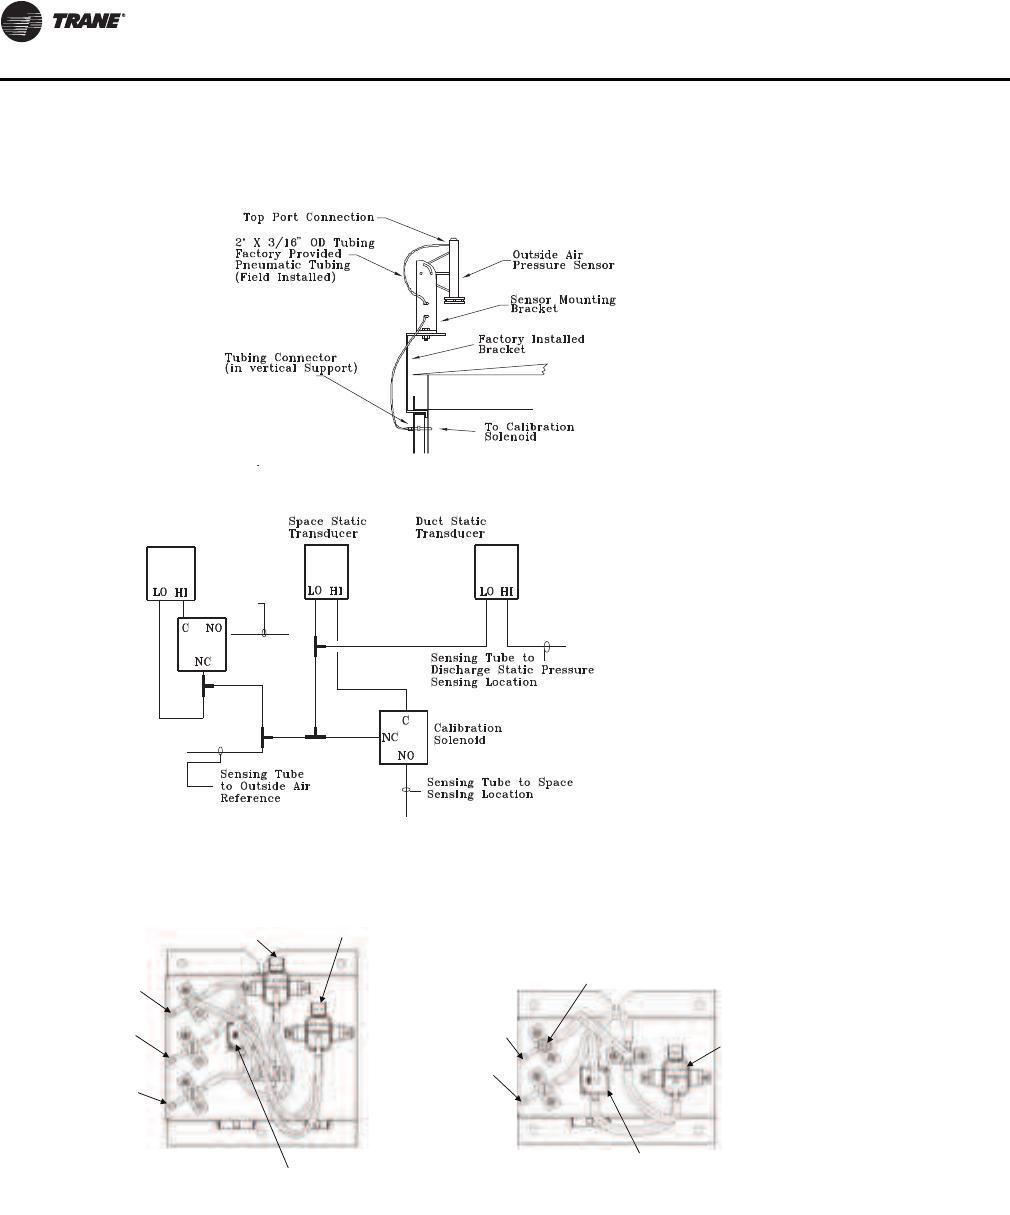 Intellipak Trane Compressor Wiring Diagram Baystat 150a Rt Svx36p En Installation Operation And On